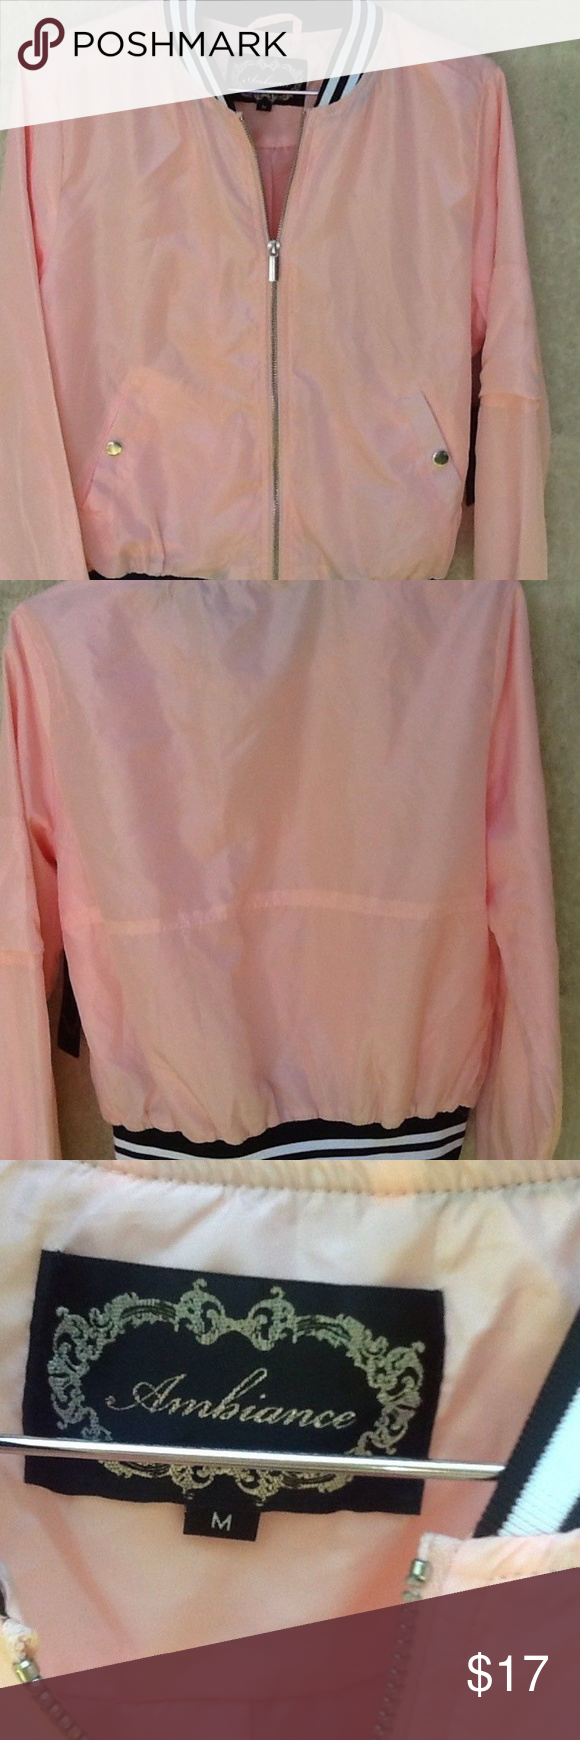 Ambiance Light Pink Bomber Jacket Size M Ambiance Light Pink Bomber Jacket Size M Nwt 100 Polyester Measur Light Pink Bomber Jacket Pink Bomber Jacket Jackets [ 1740 x 580 Pixel ]